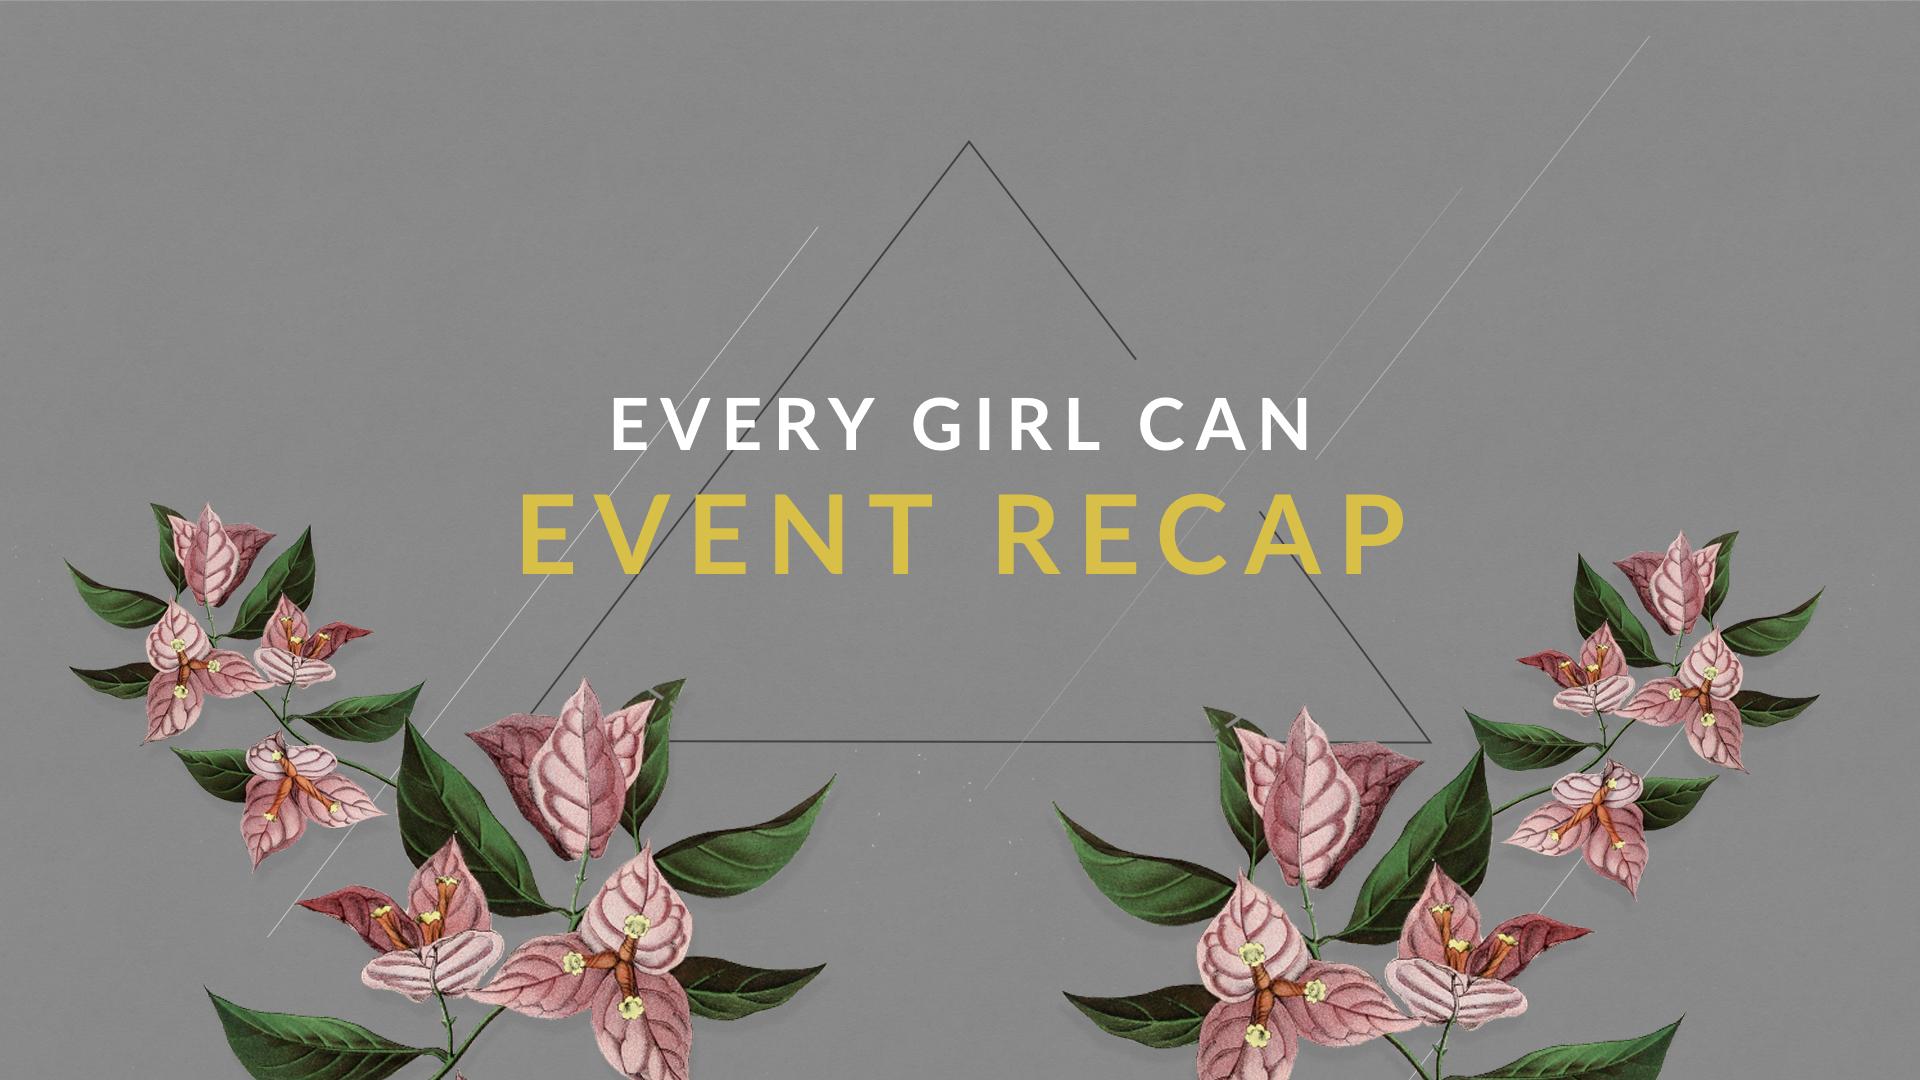 Every Girl Can Recap Deck.001.jpeg